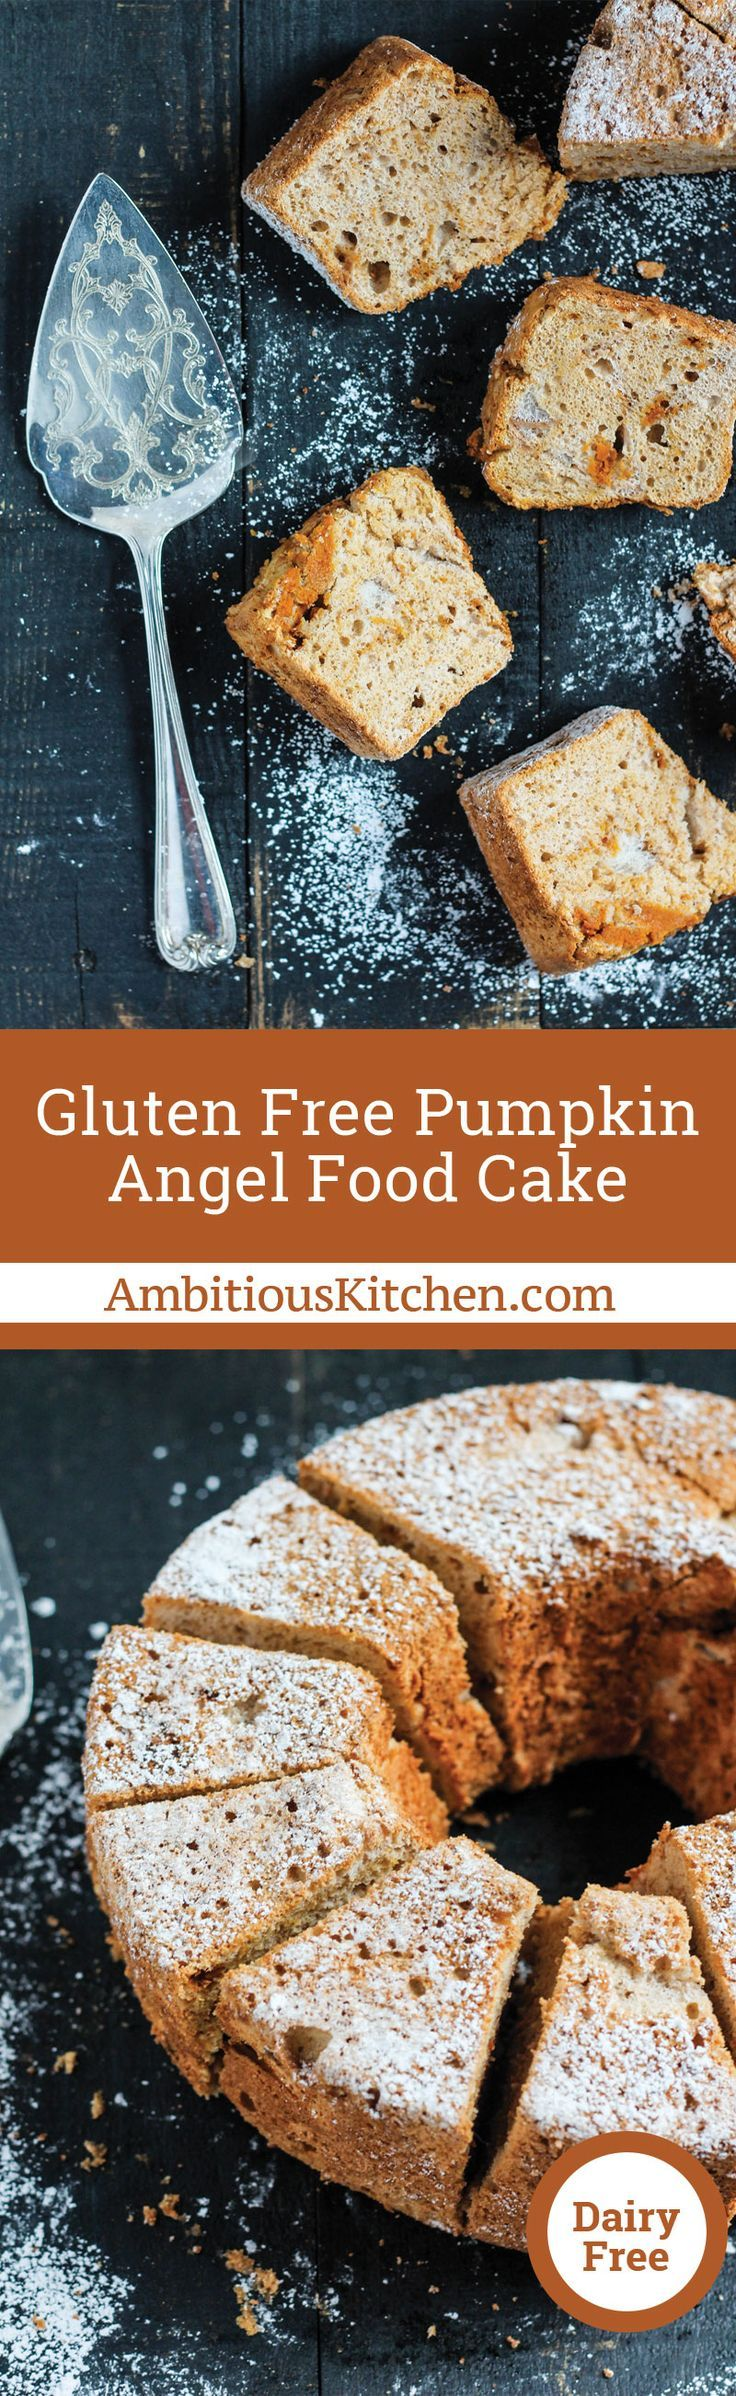 Gluten free pumpkin angel food cake recipe gluten free